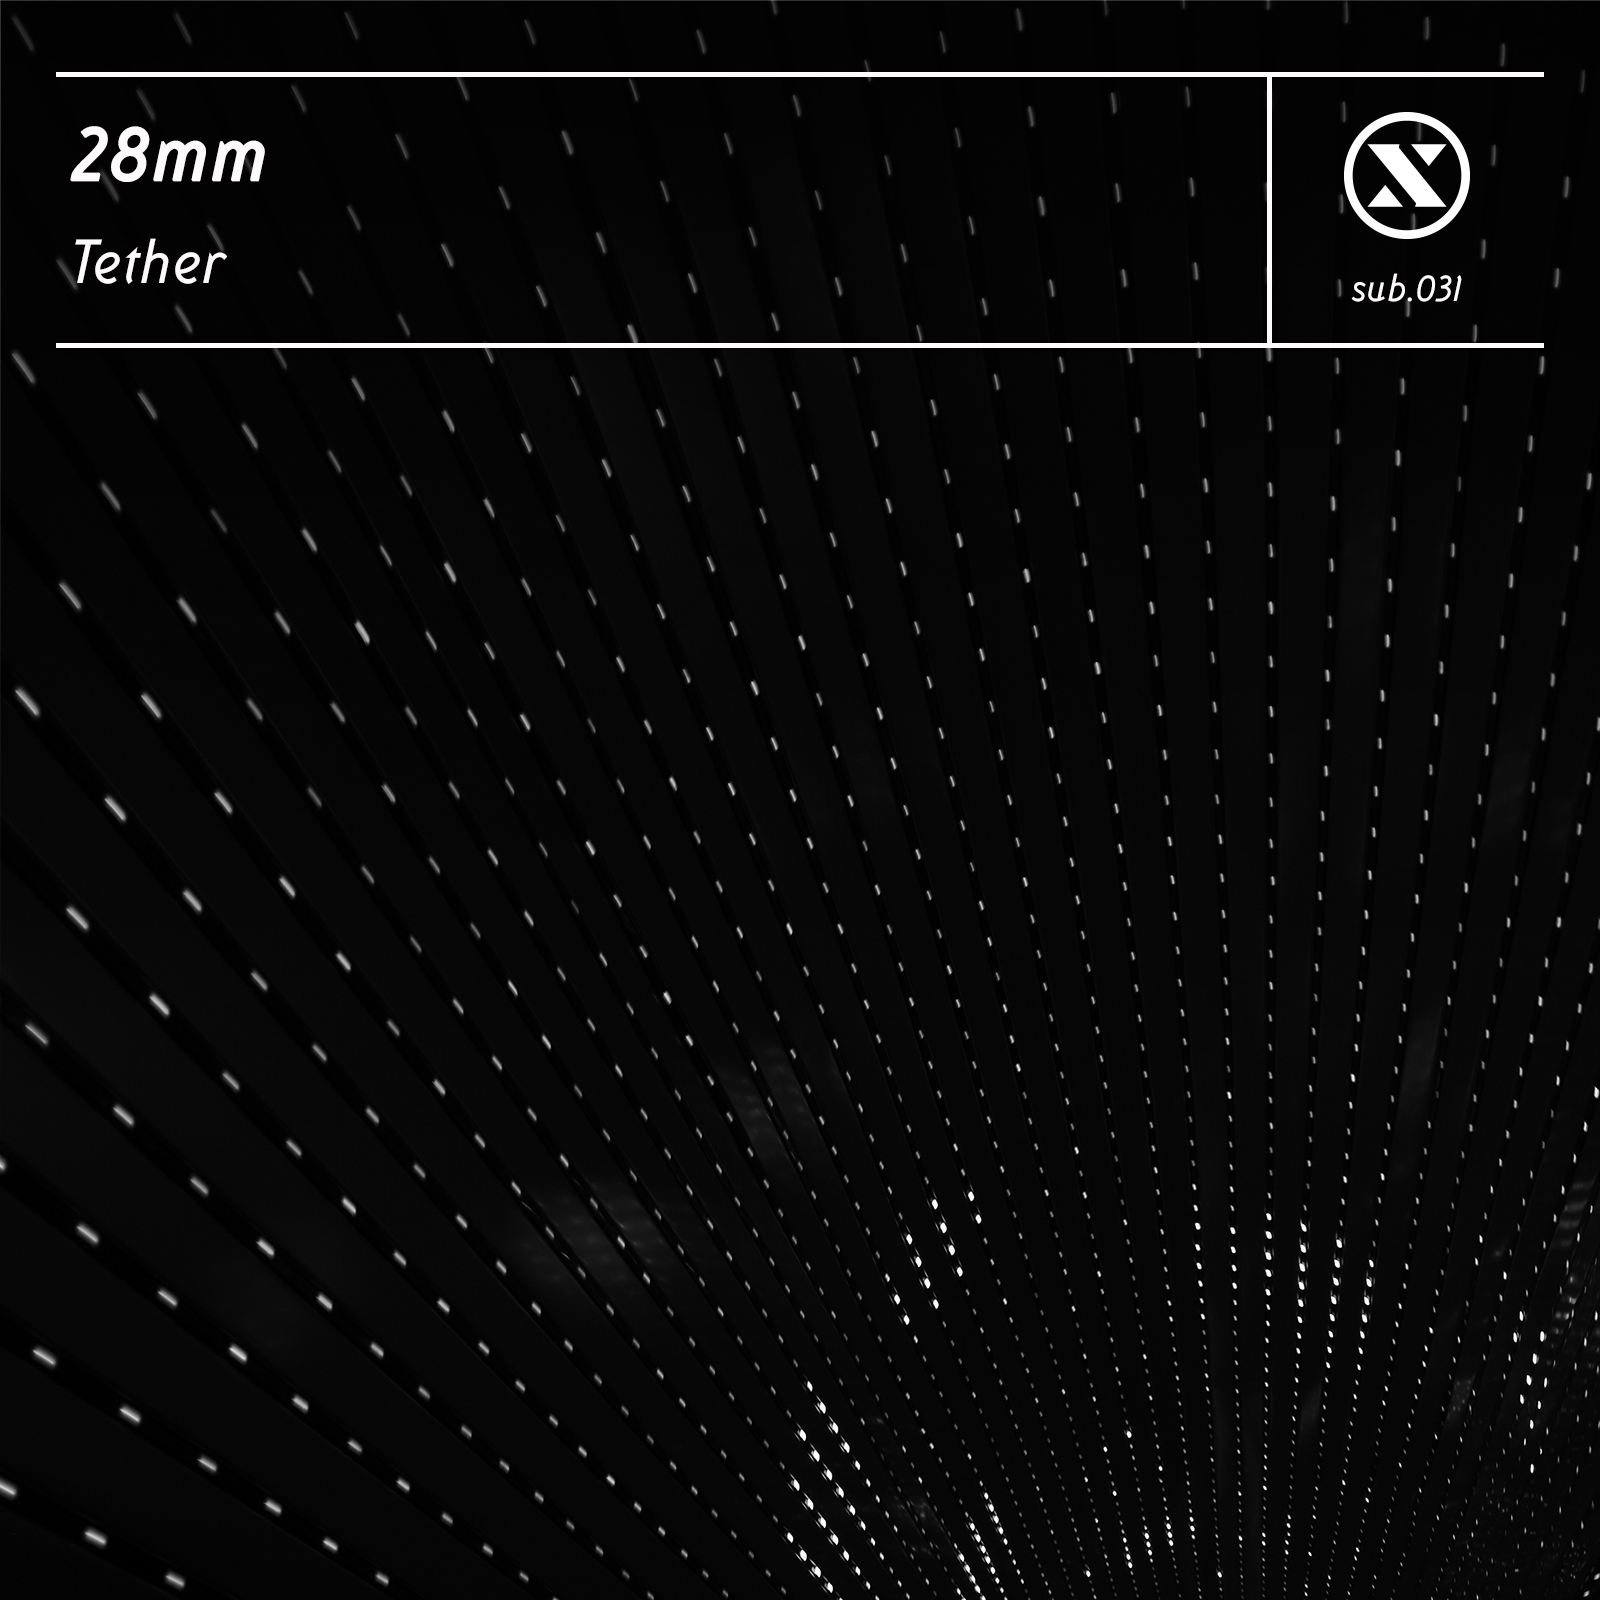 subdrive-label-28mm-sub31-website